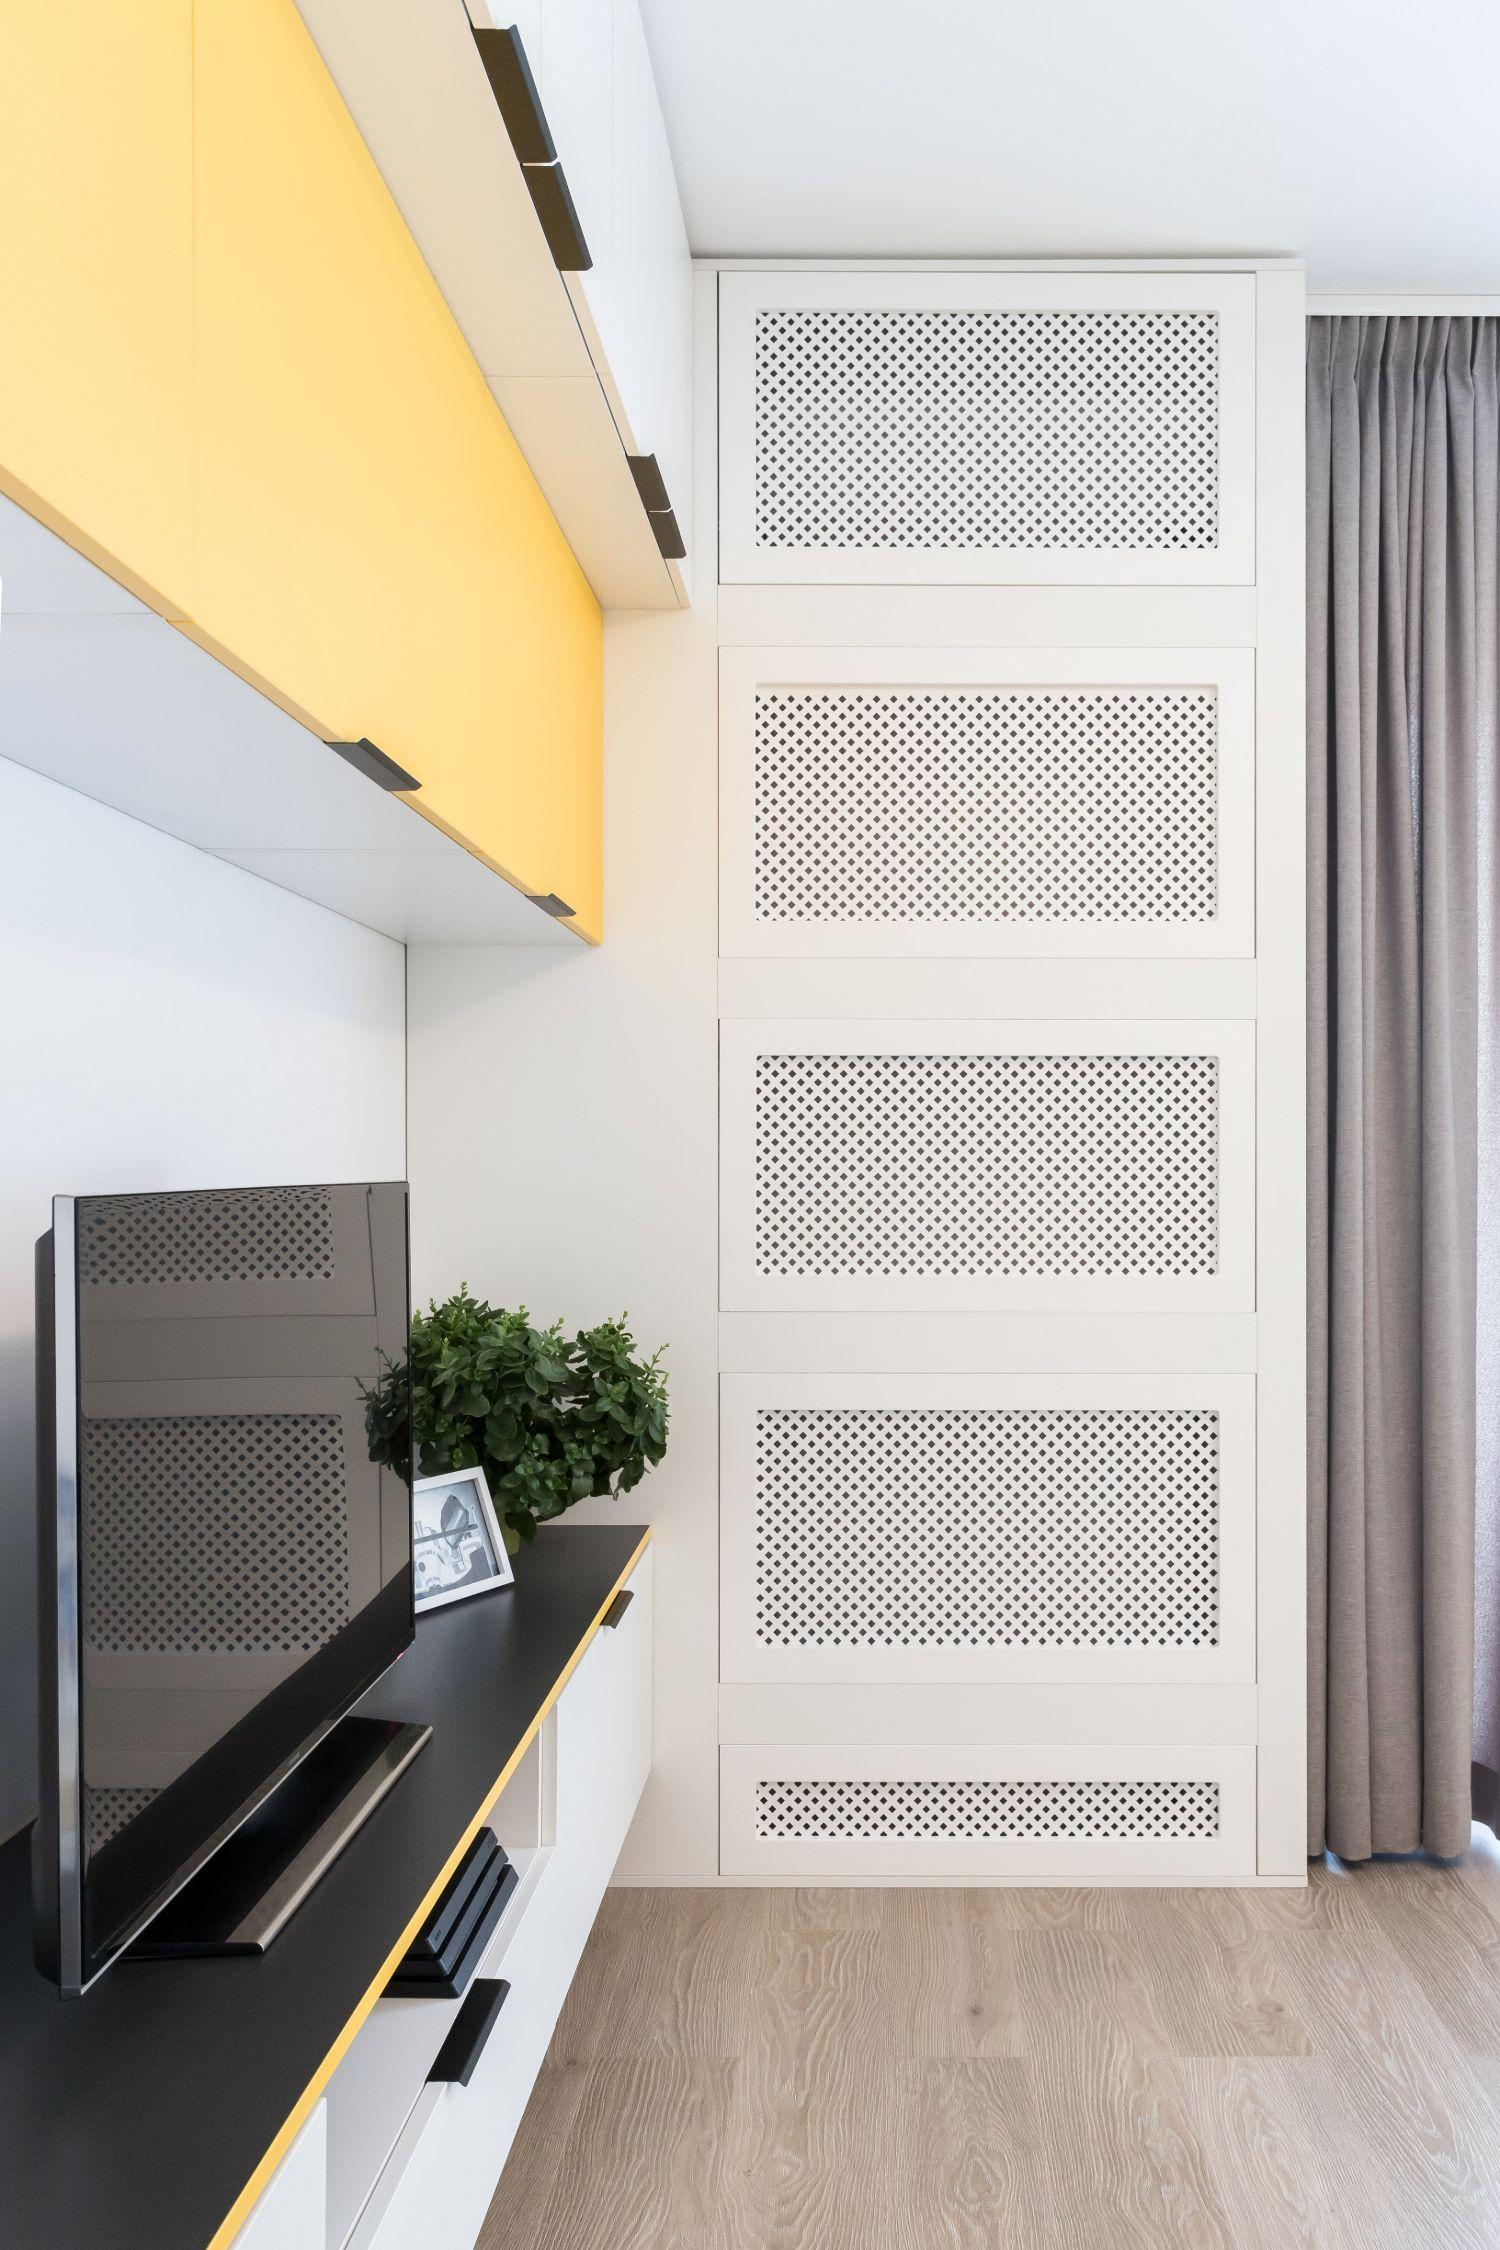 Aer conditionat ascuns in mobilier pe comanda - arh. int. Stefania Bobaru VIM Studio